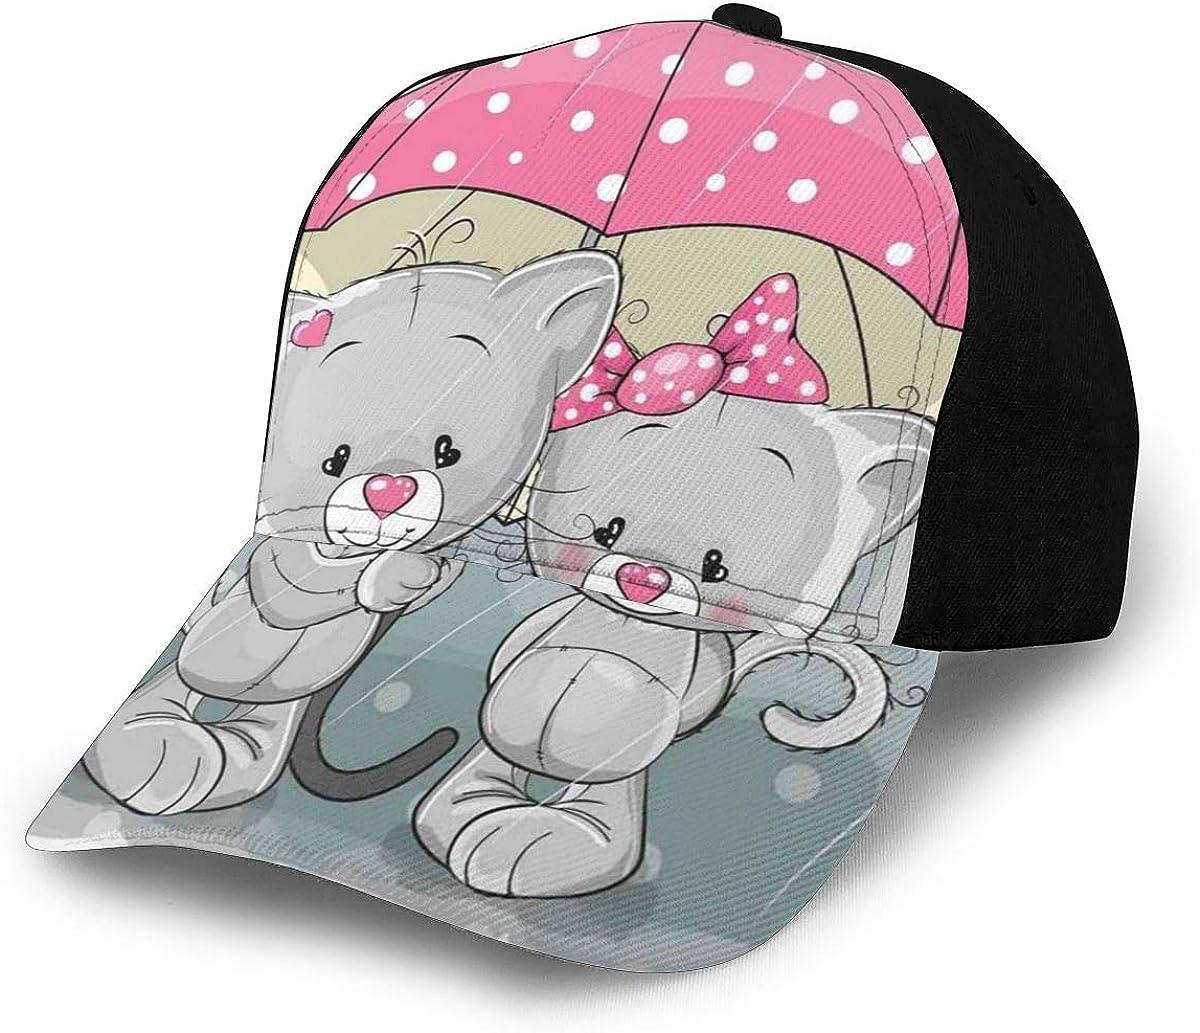 Unisex Classic 3D Baseball Cap Trucker Hat Partner Kittens with Umbrella Under Rain Cute Couple Love Romance Artsy Image